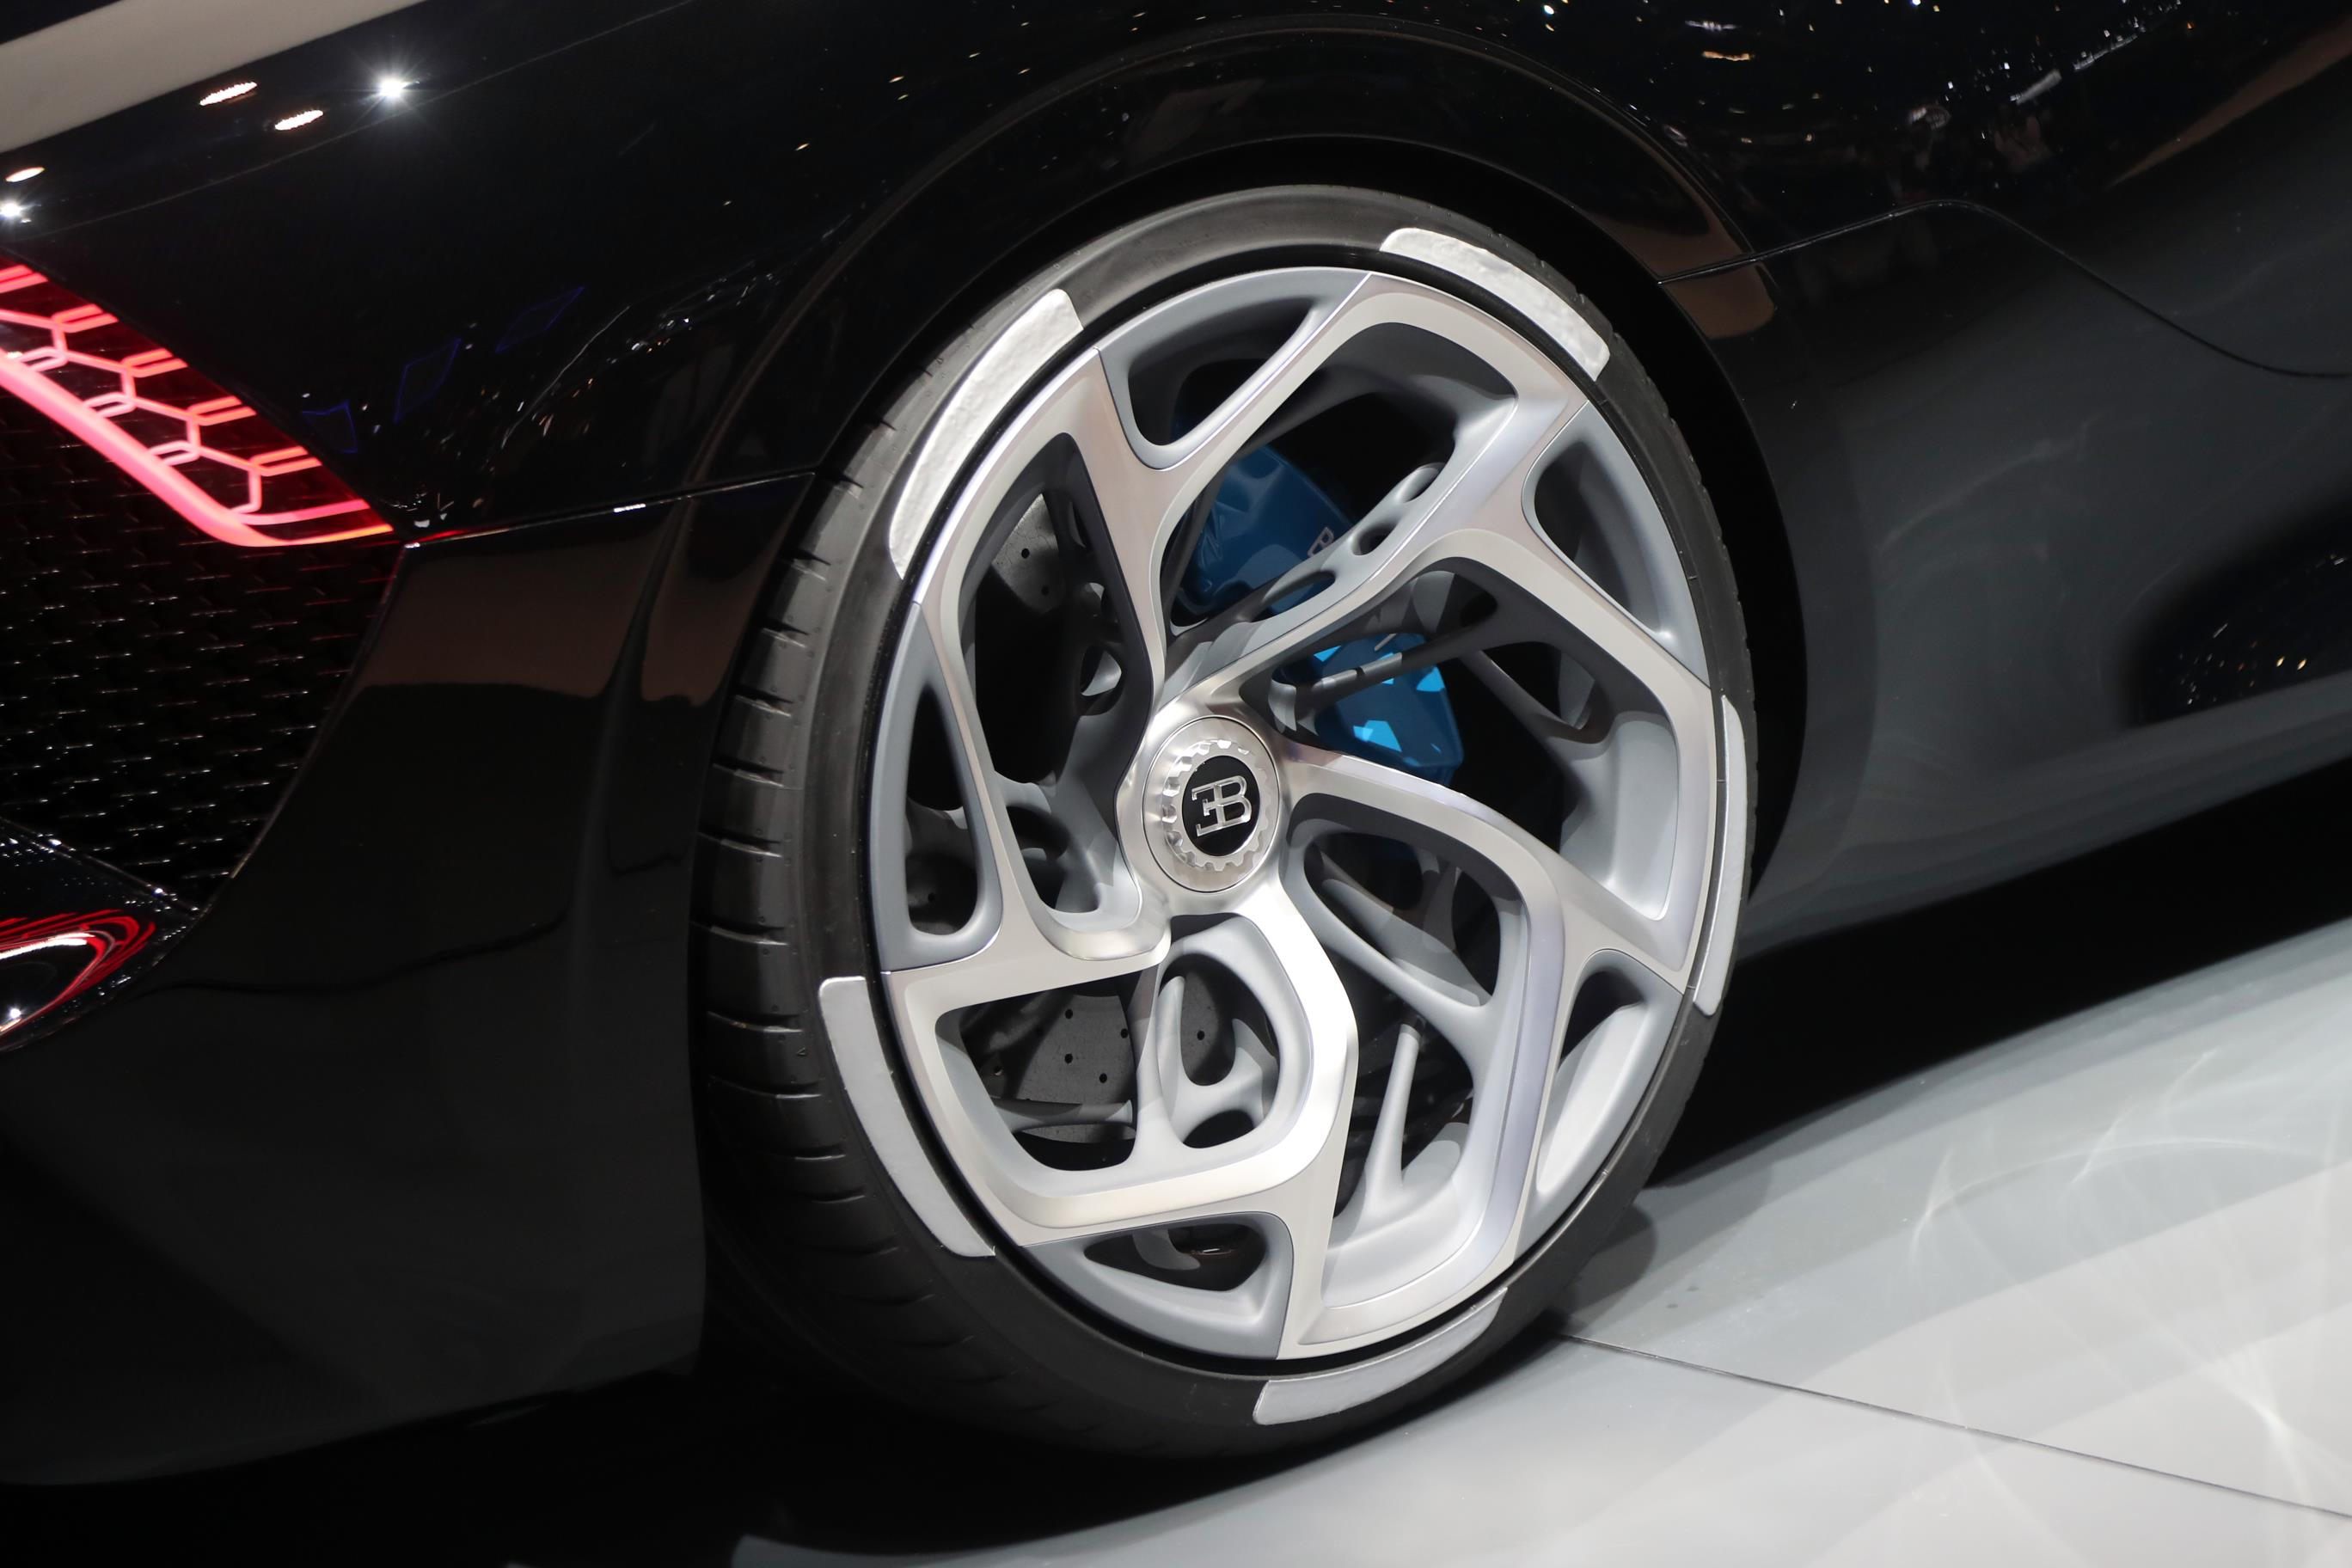 Most Expensive BMW >> Bugatti La Voiture Noire unveiled, most expensive car ever ...